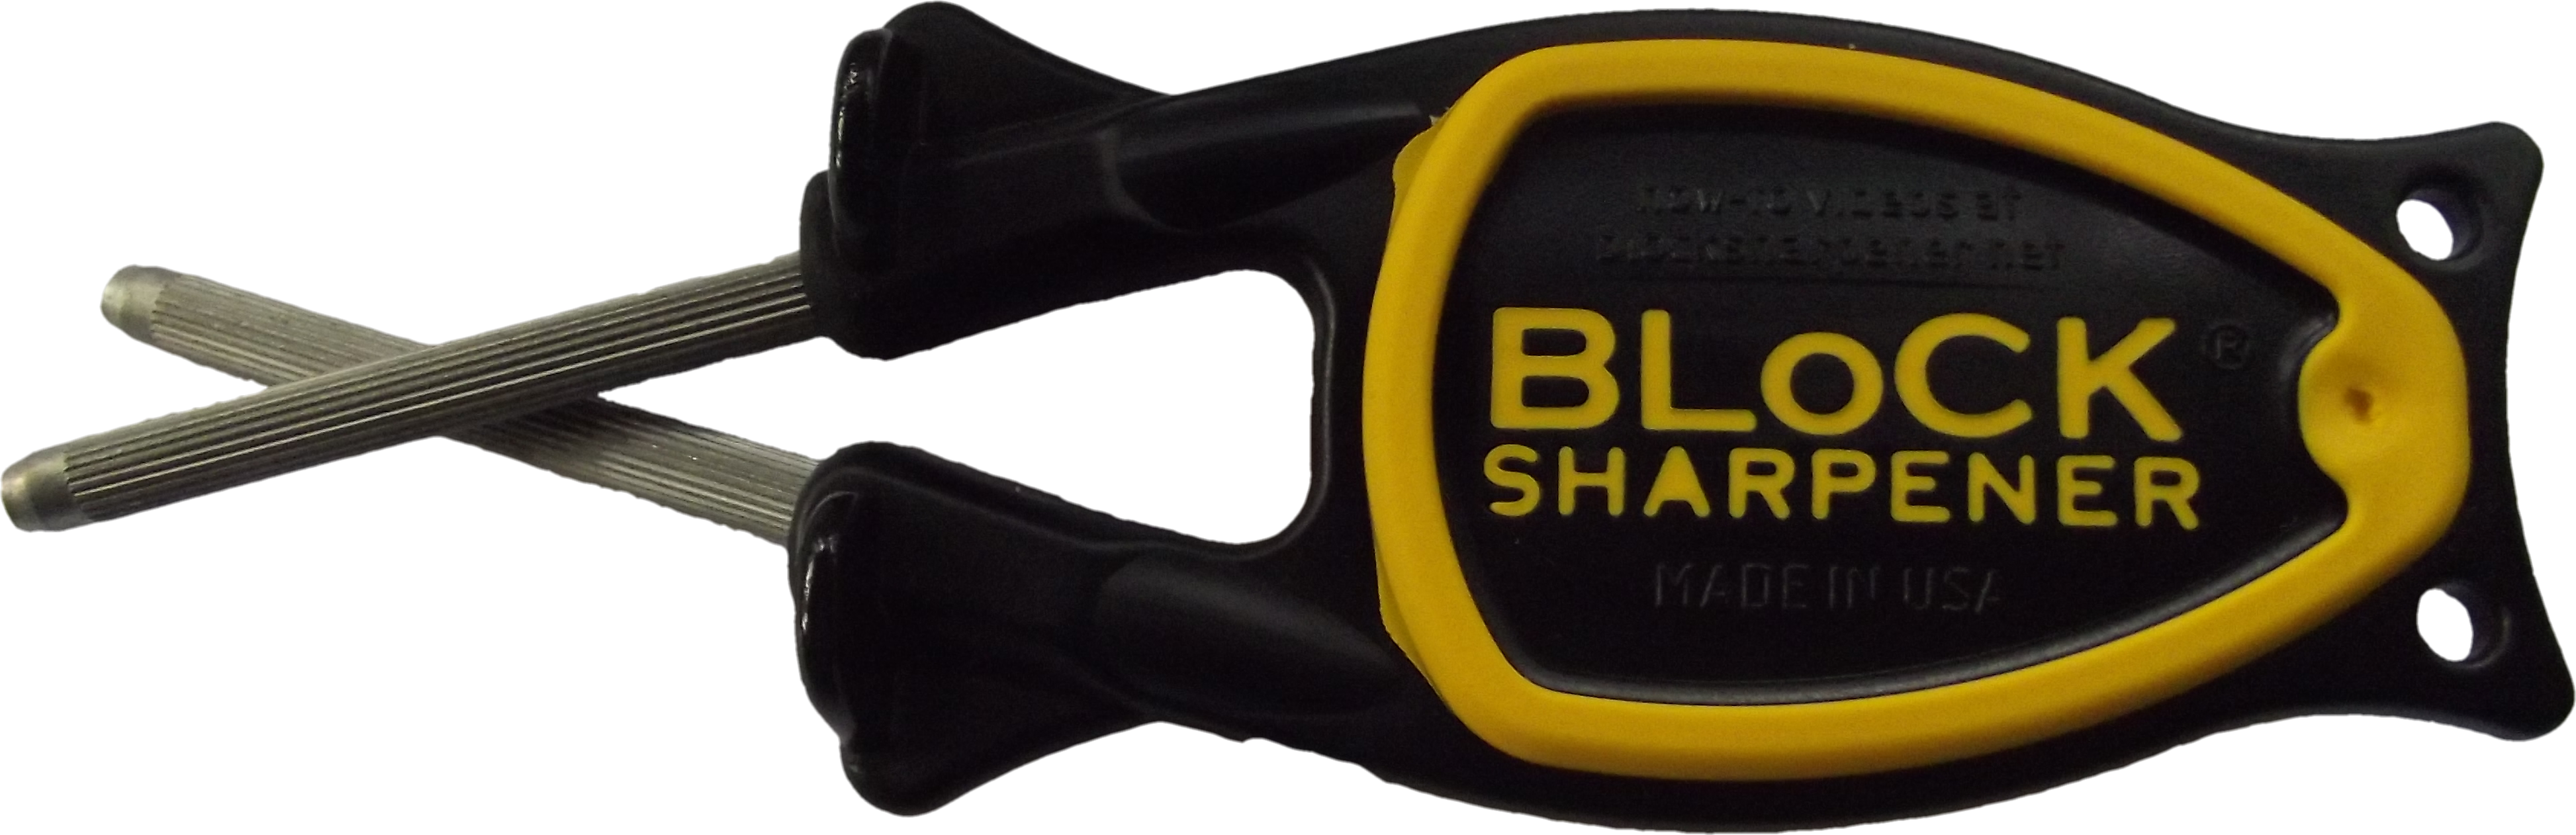 block sharpener black handle with yellow grip